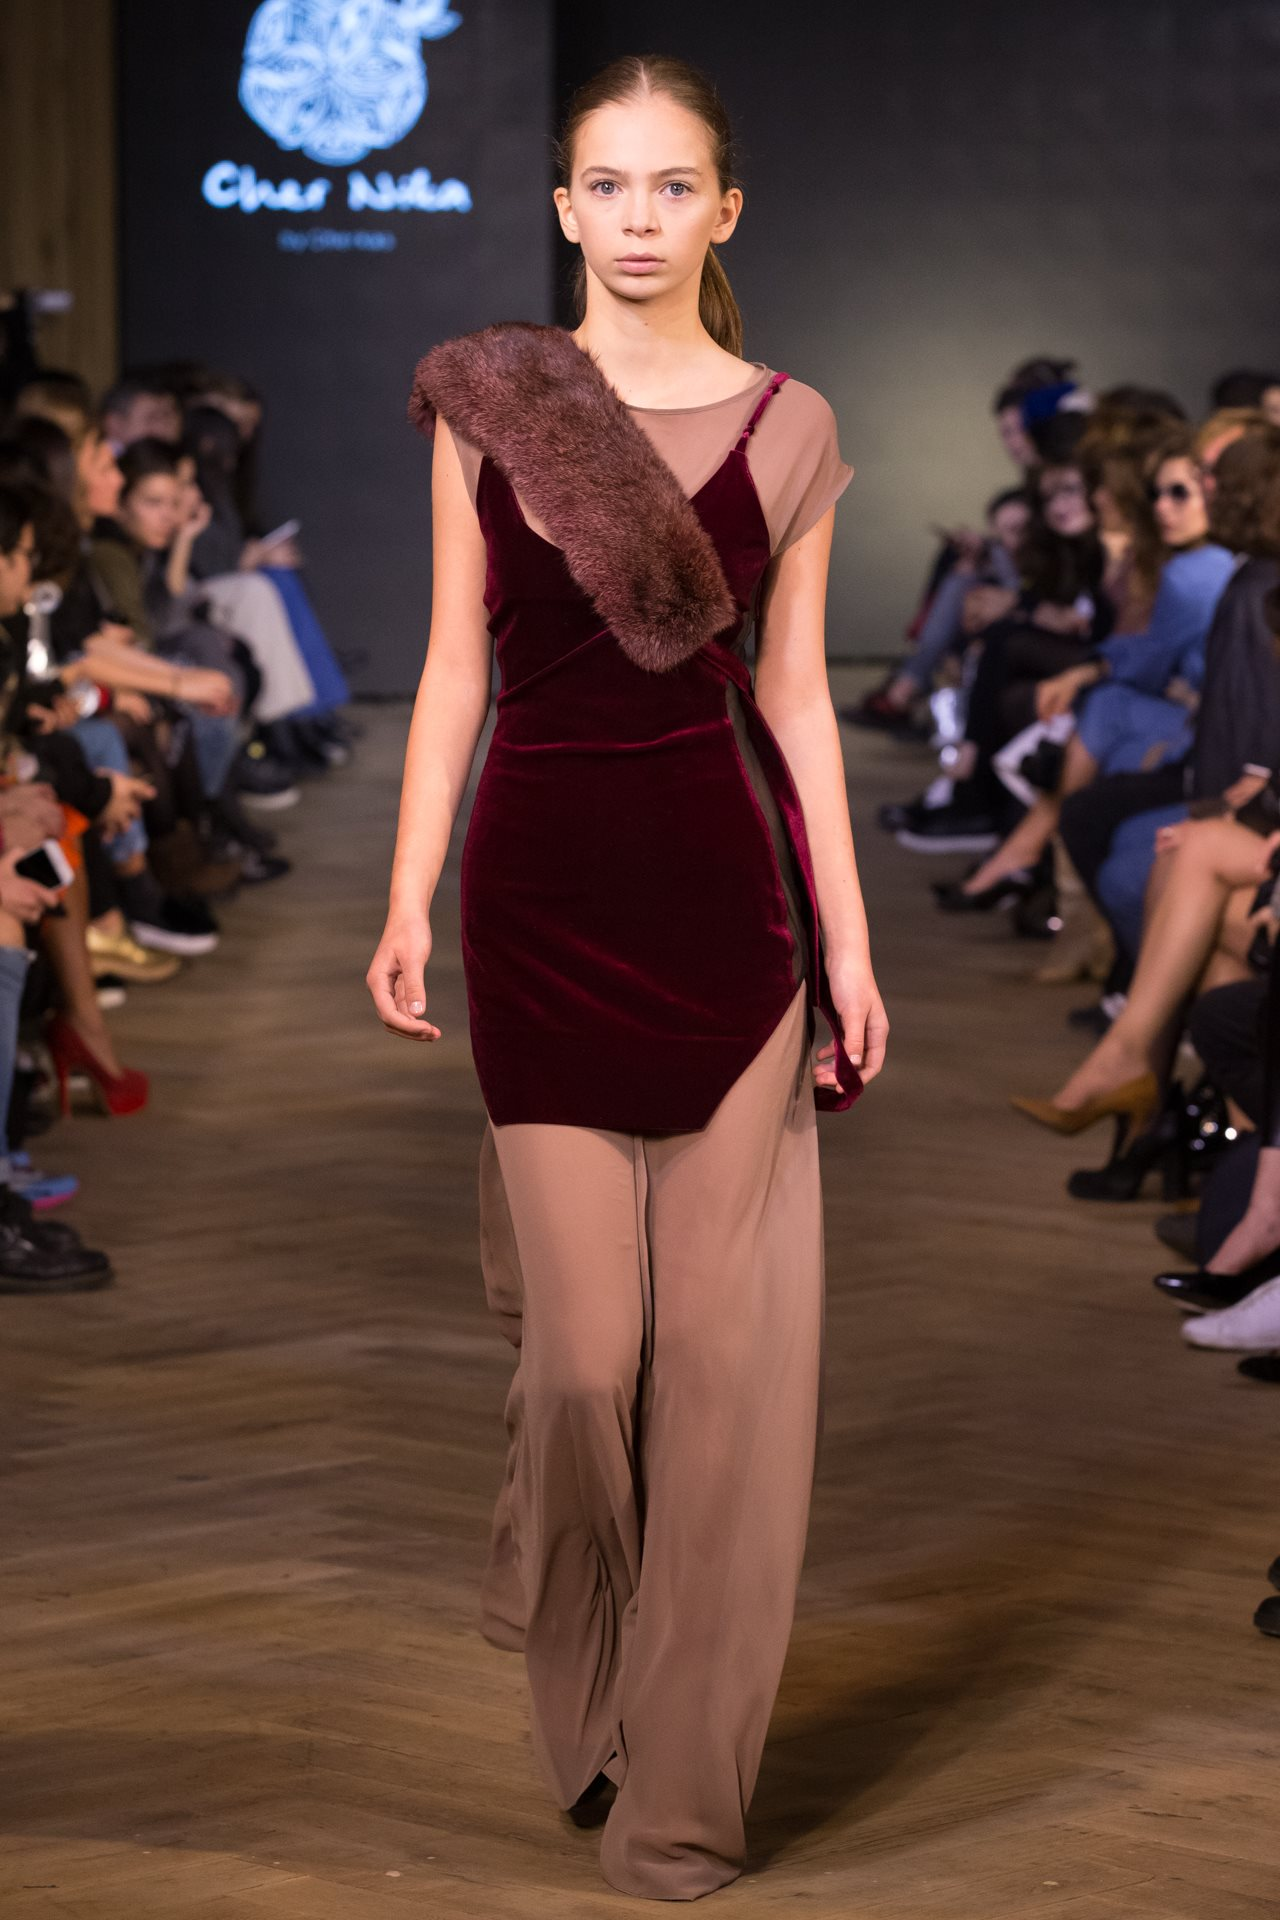 Cher Nika by Cherkas представил коллекцию в рамках Tbilisi Fashion Week